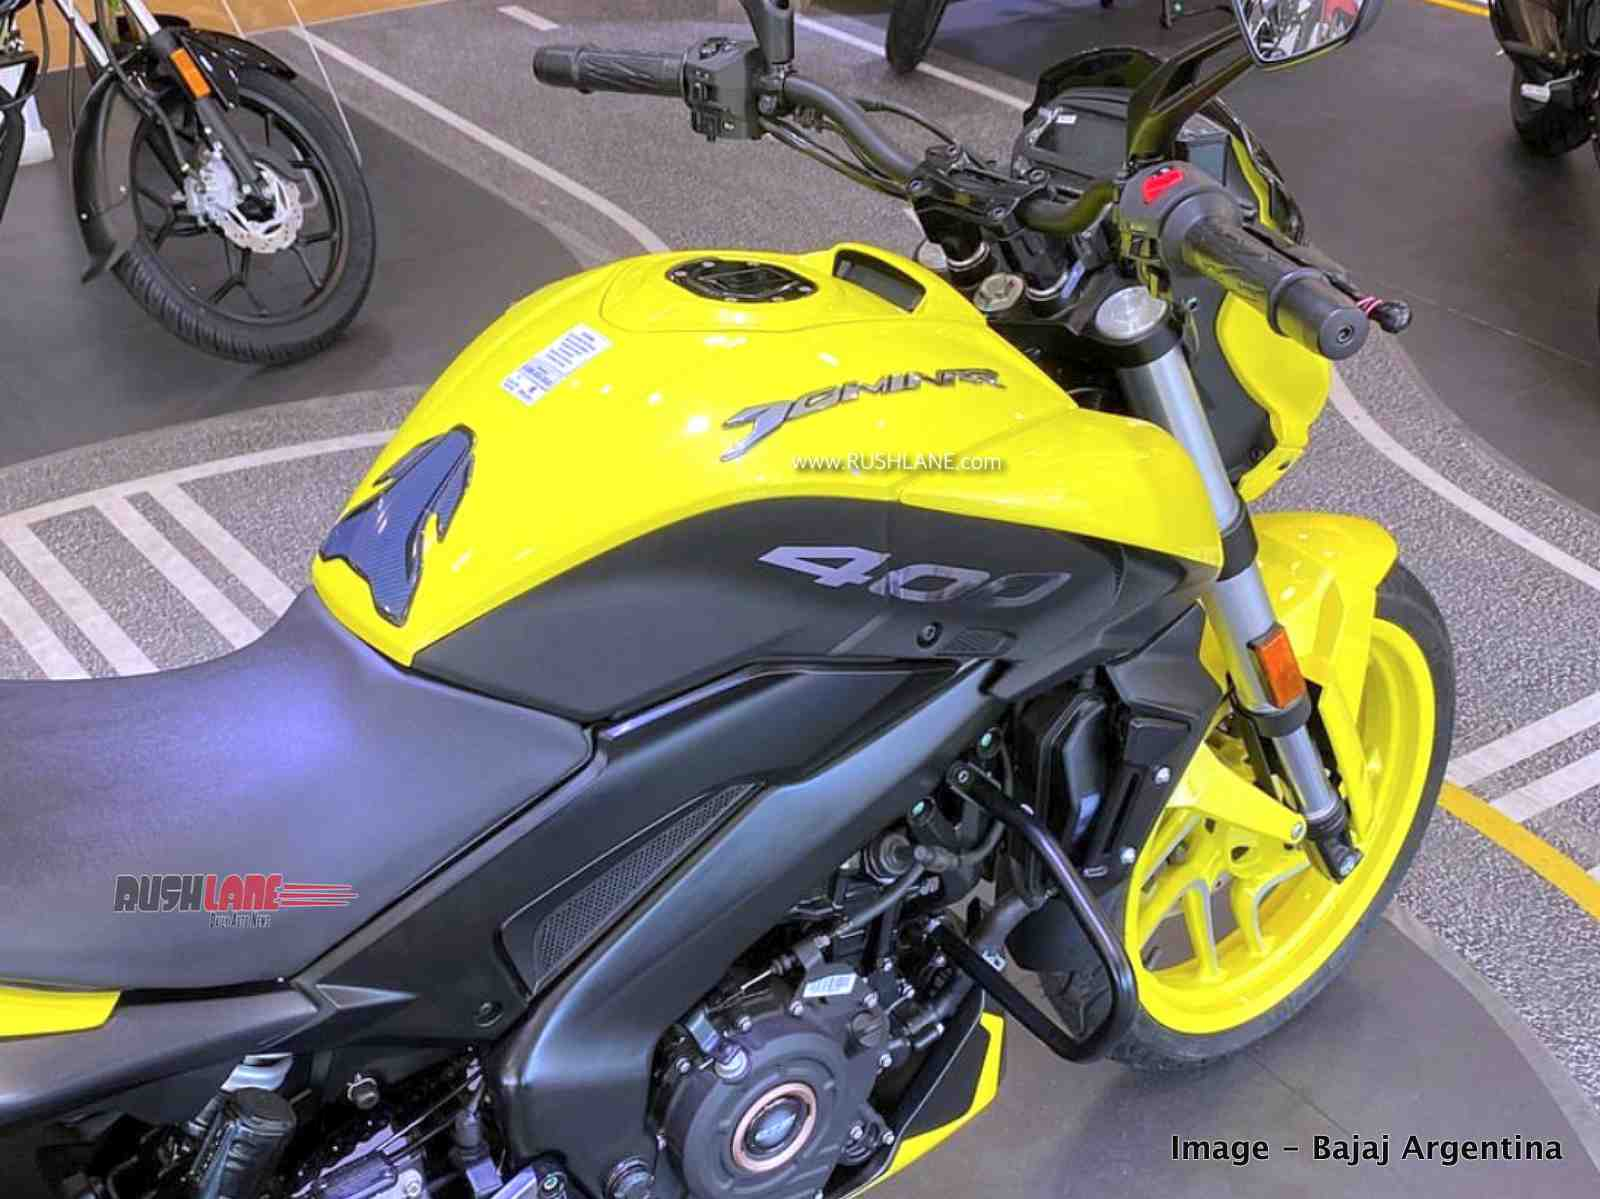 2020 Bajaj Dominar yellow